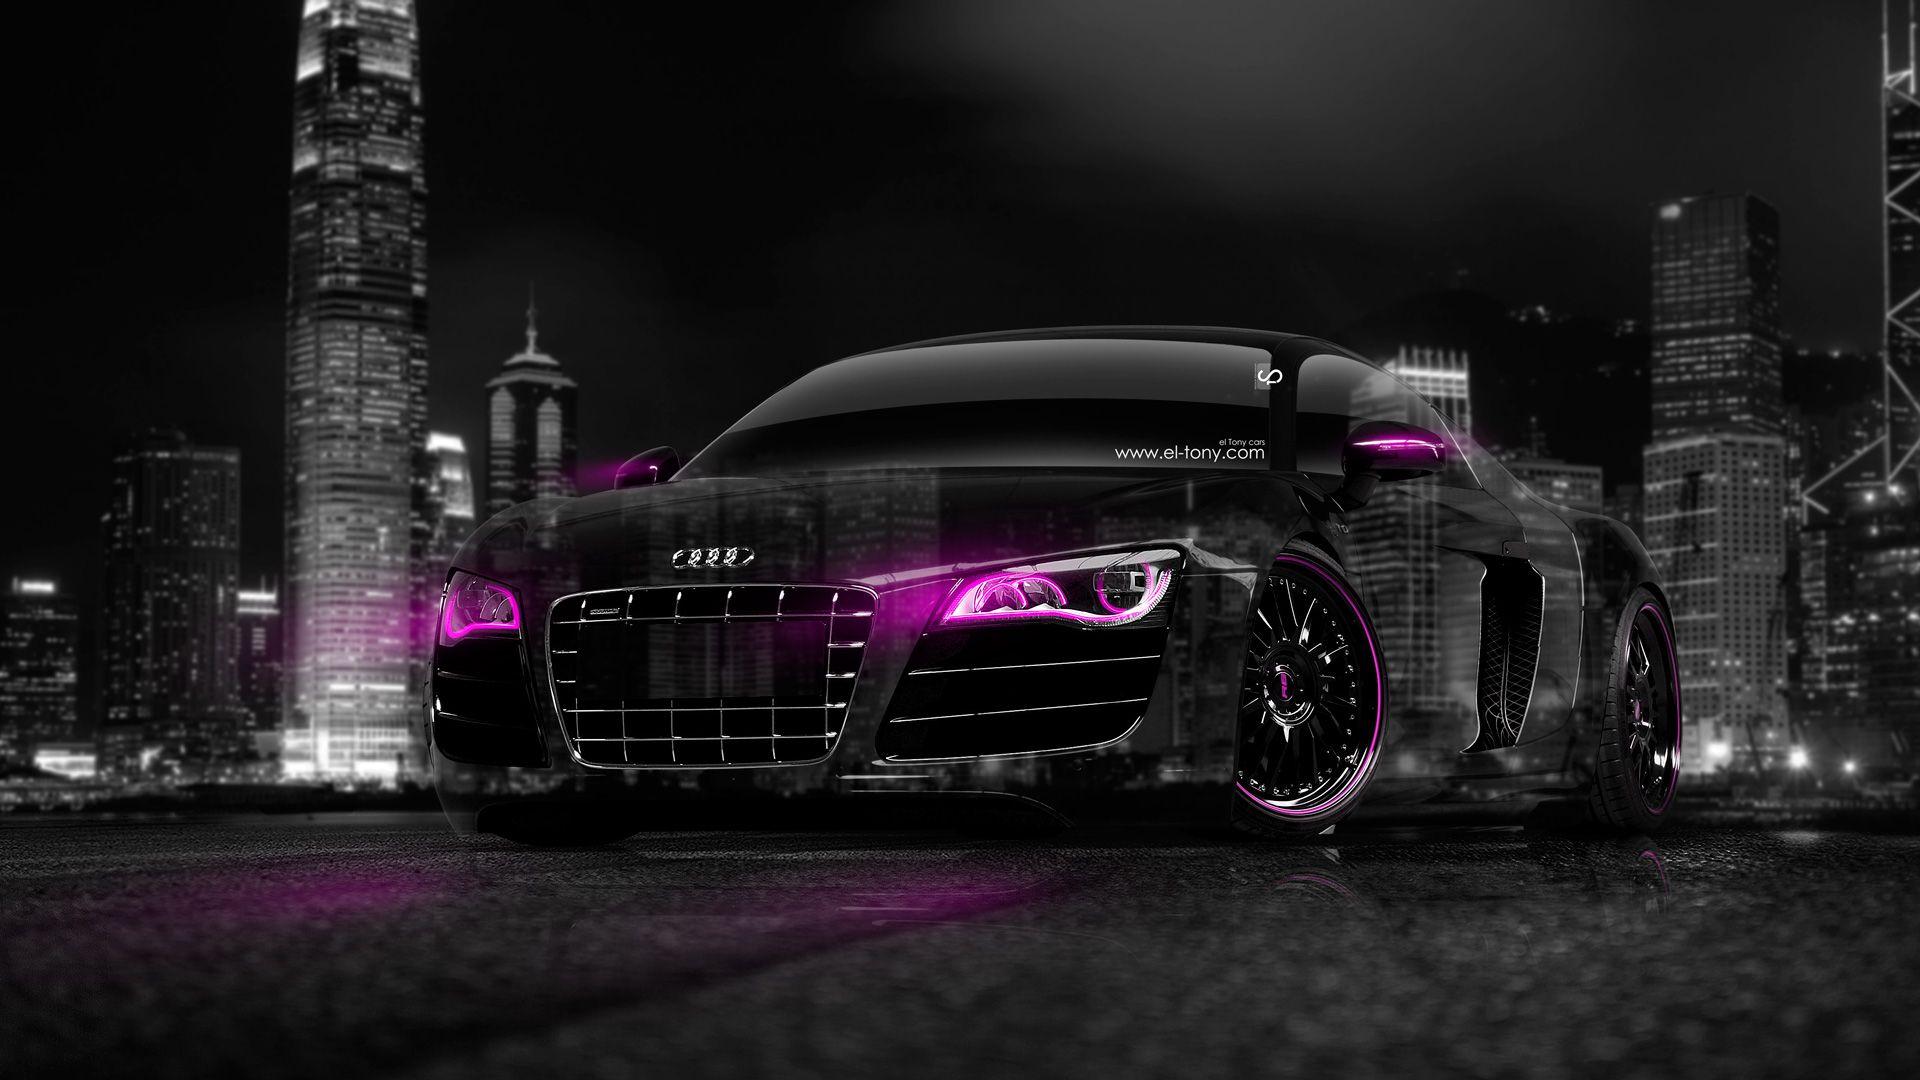 Audi Wallpaper High Quality Cars Wallpaper Audi Audi Black Audi